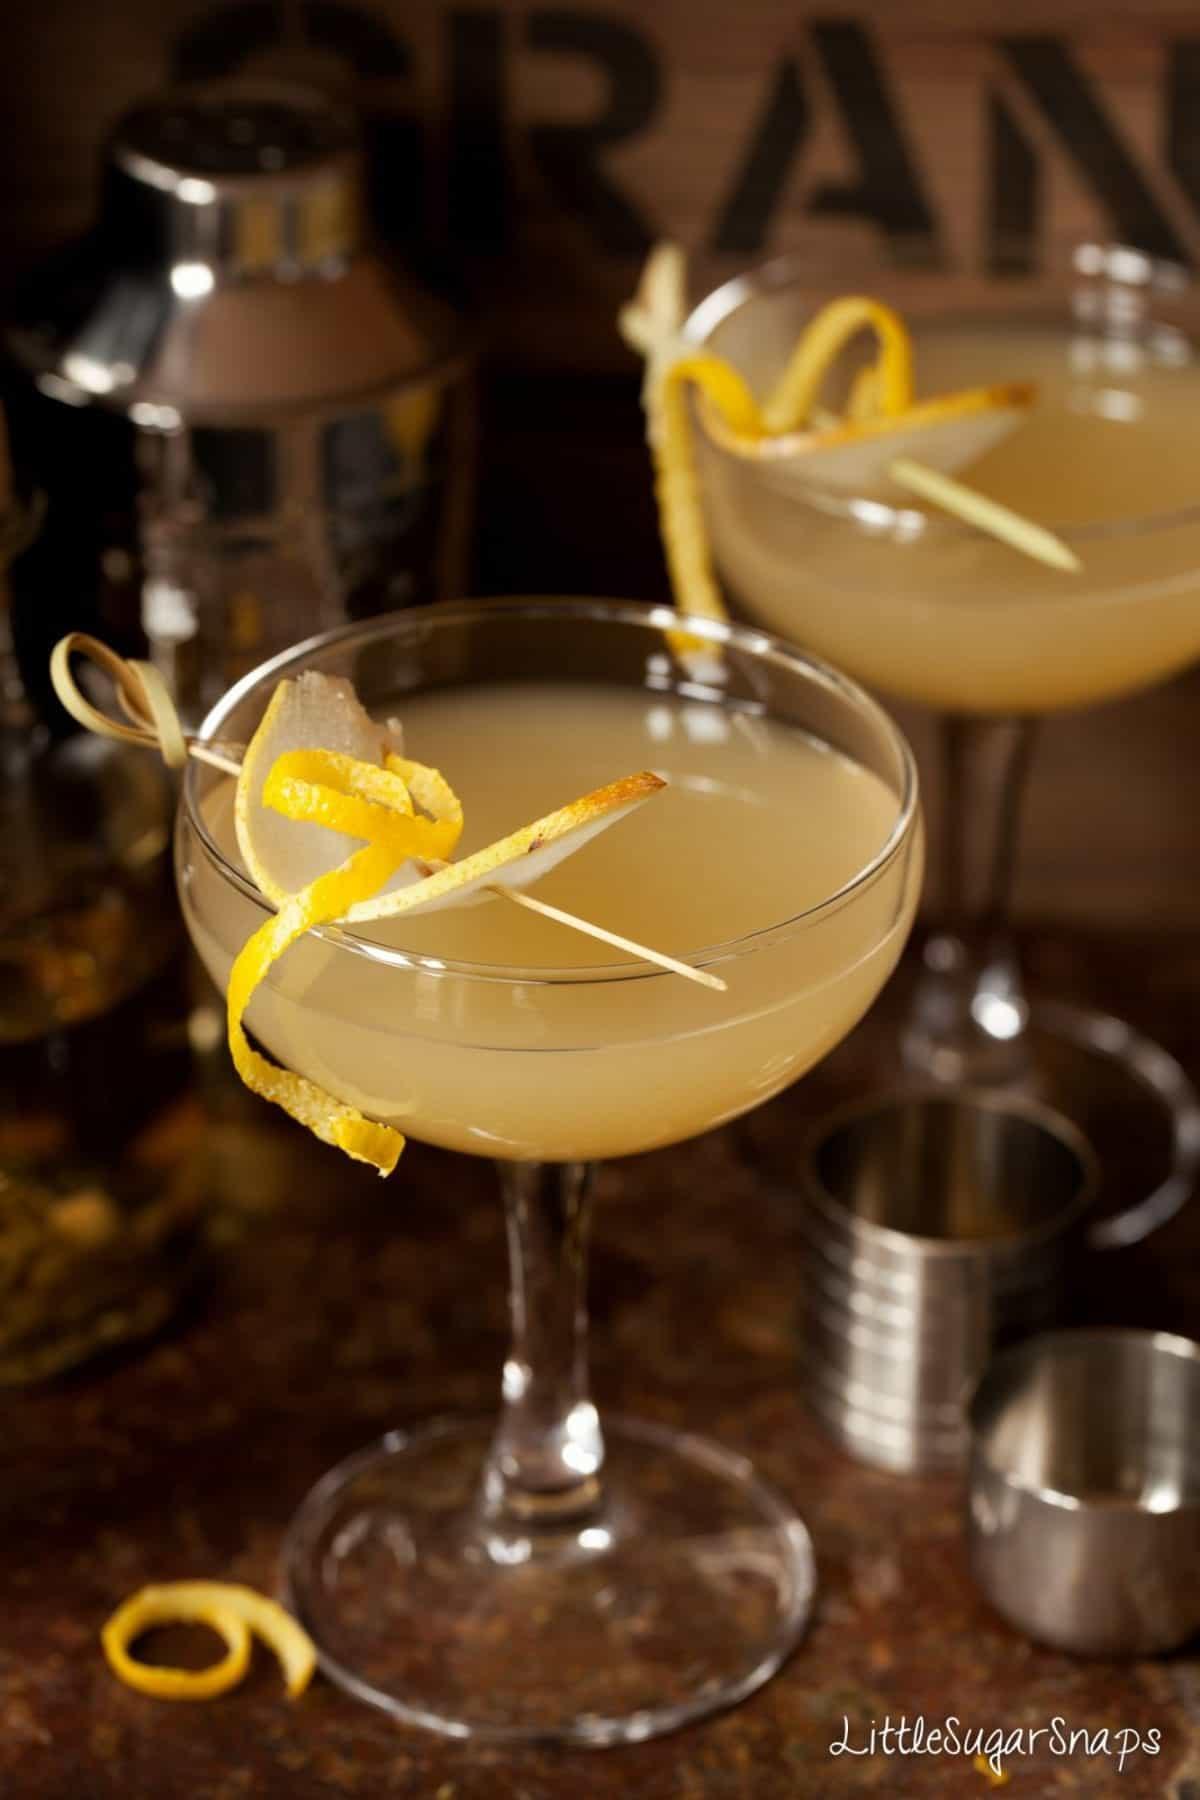 Cardamom Pear Martini - an infused vodka recipe